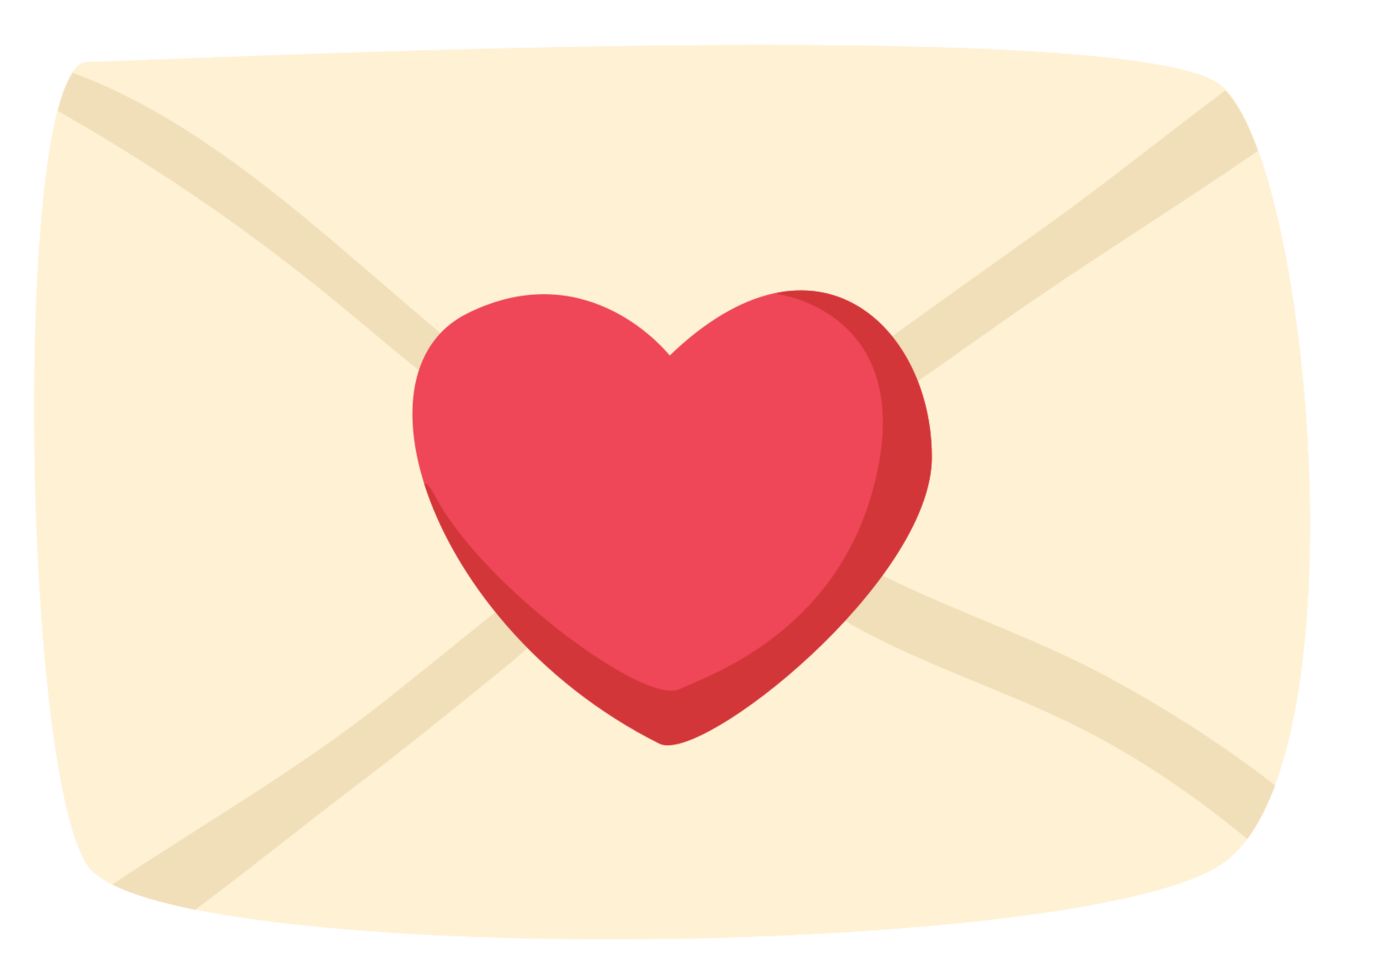 Heart letter png